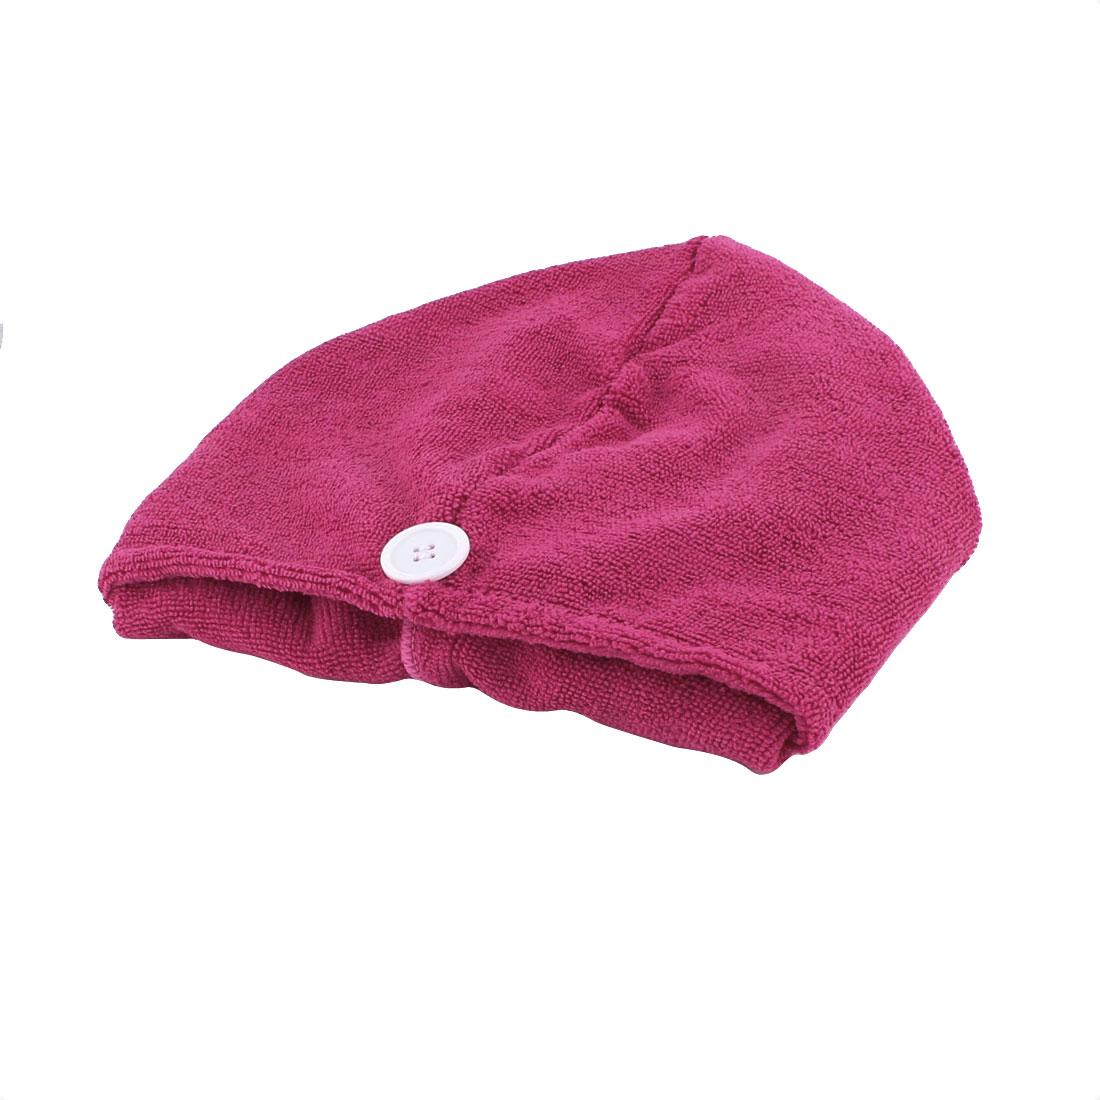 Lady Microfiber Triangle Shower Bathing Bath Hair Drying Dry Cap Hat Towel Magenta